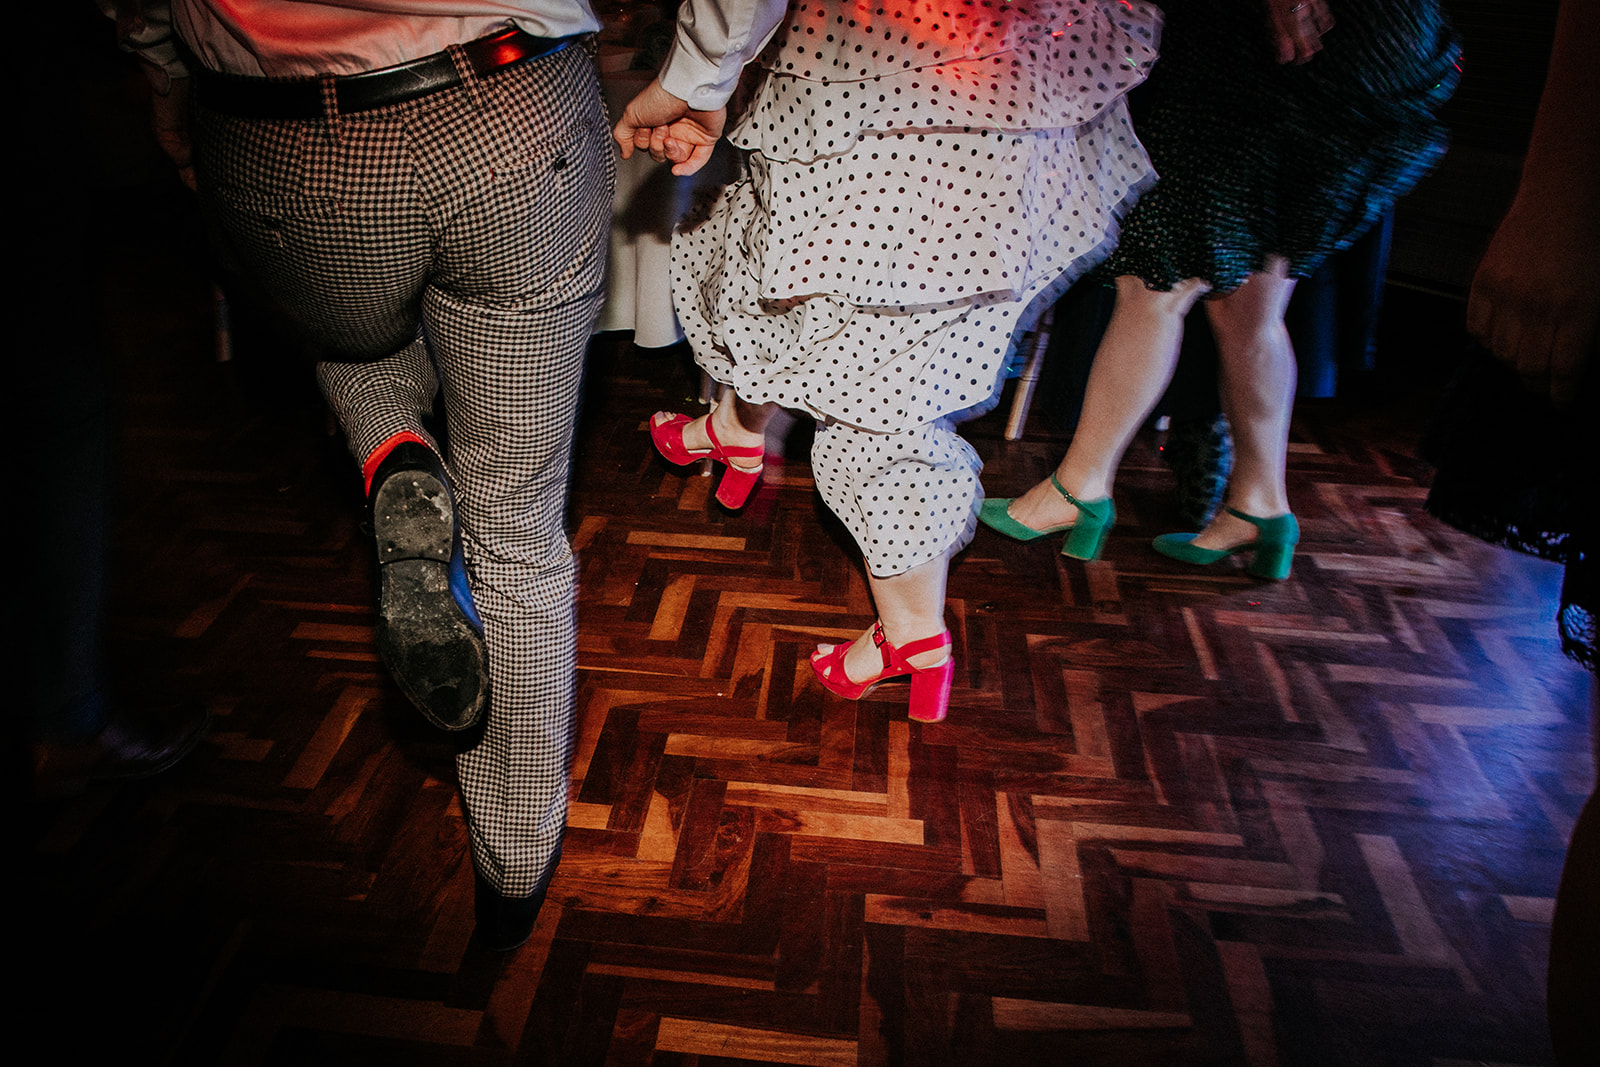 rutland wedding - fun wedding - east midlands wedding planner - Leicestershire wedding planning - nottingham wedding planning - wedding dancing photo